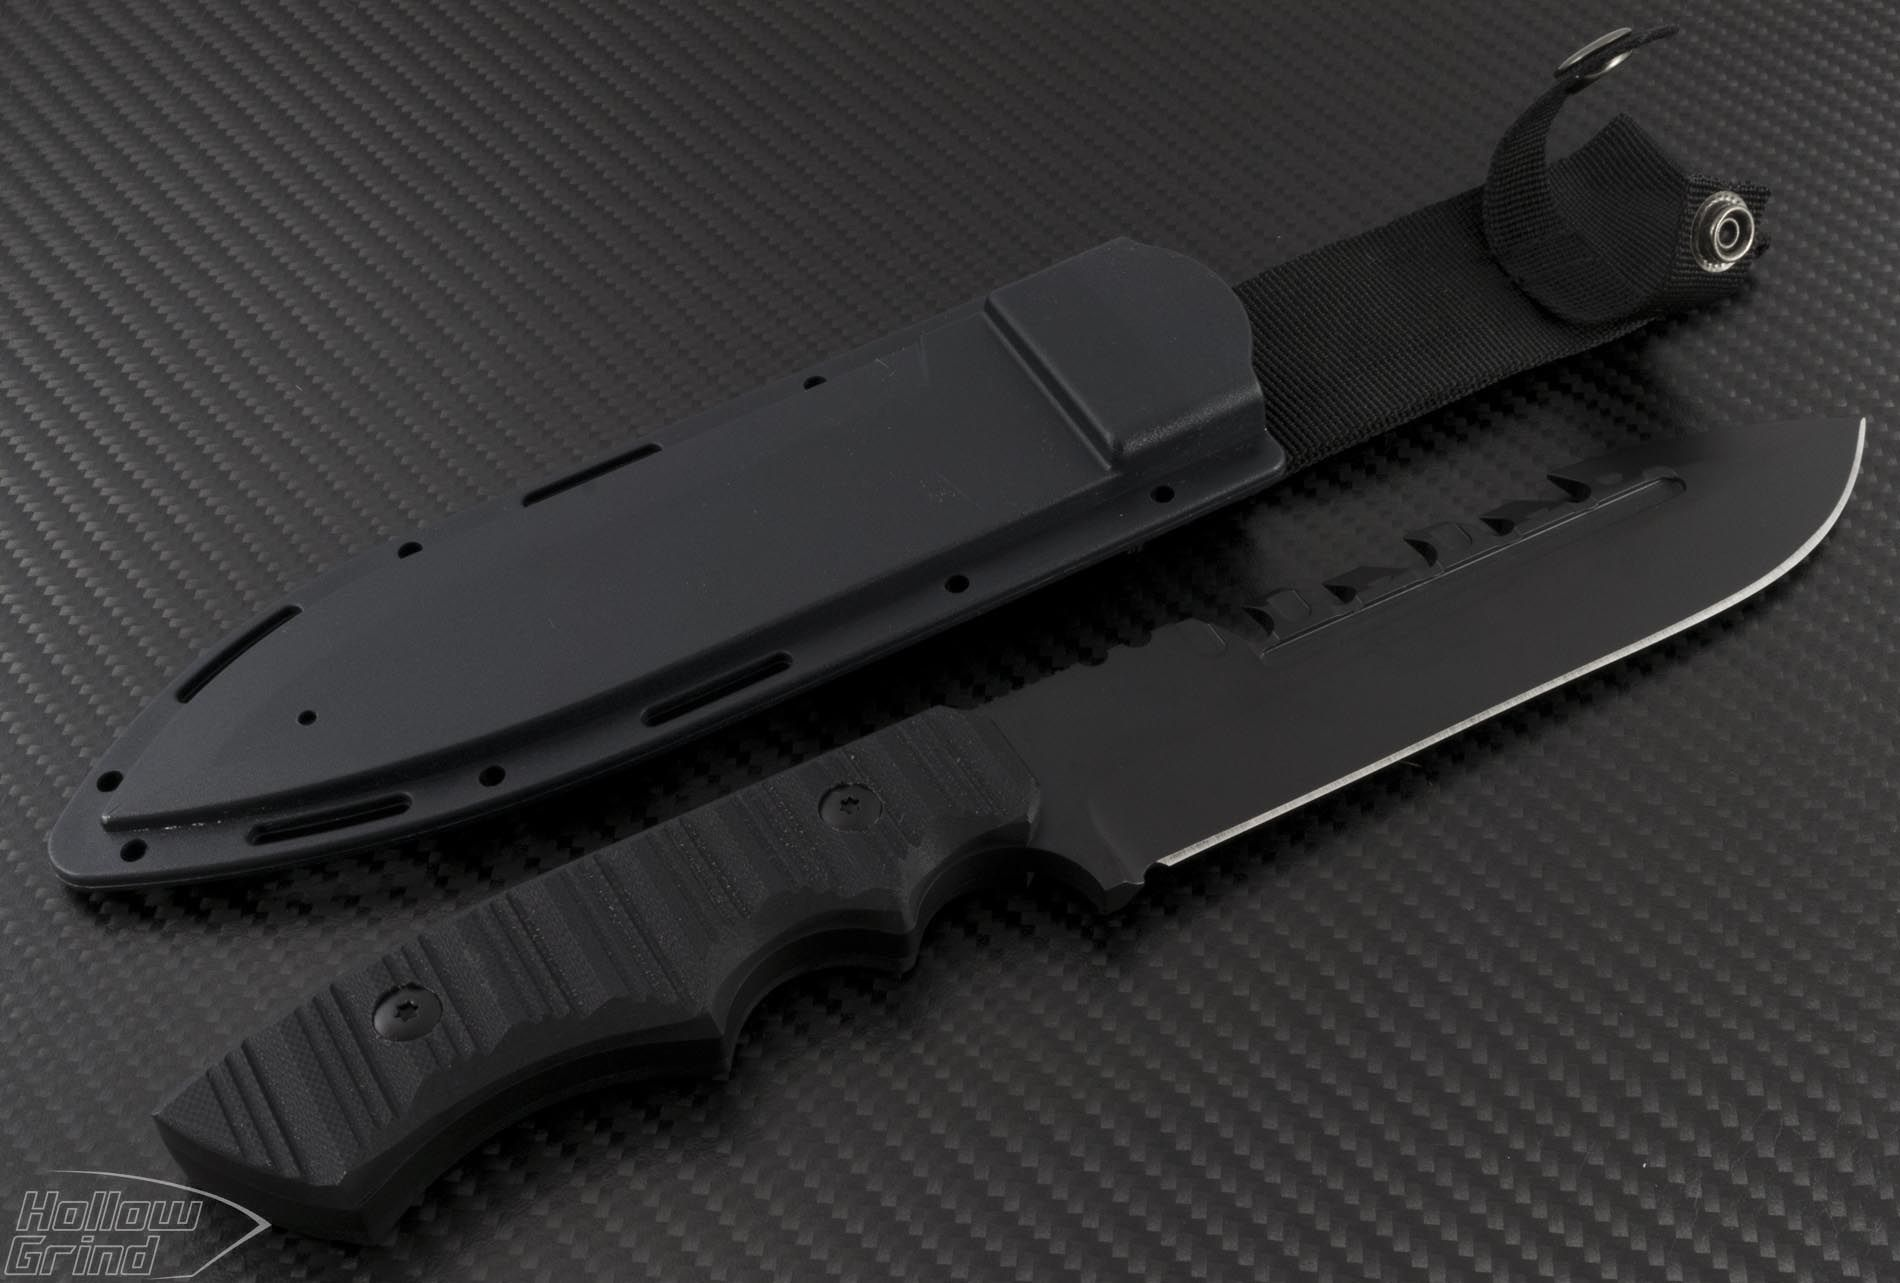 (#JB-Coroner-Black) Brous Blades Coroner Black - Hollow Grind - Authorized Microtech Dealer